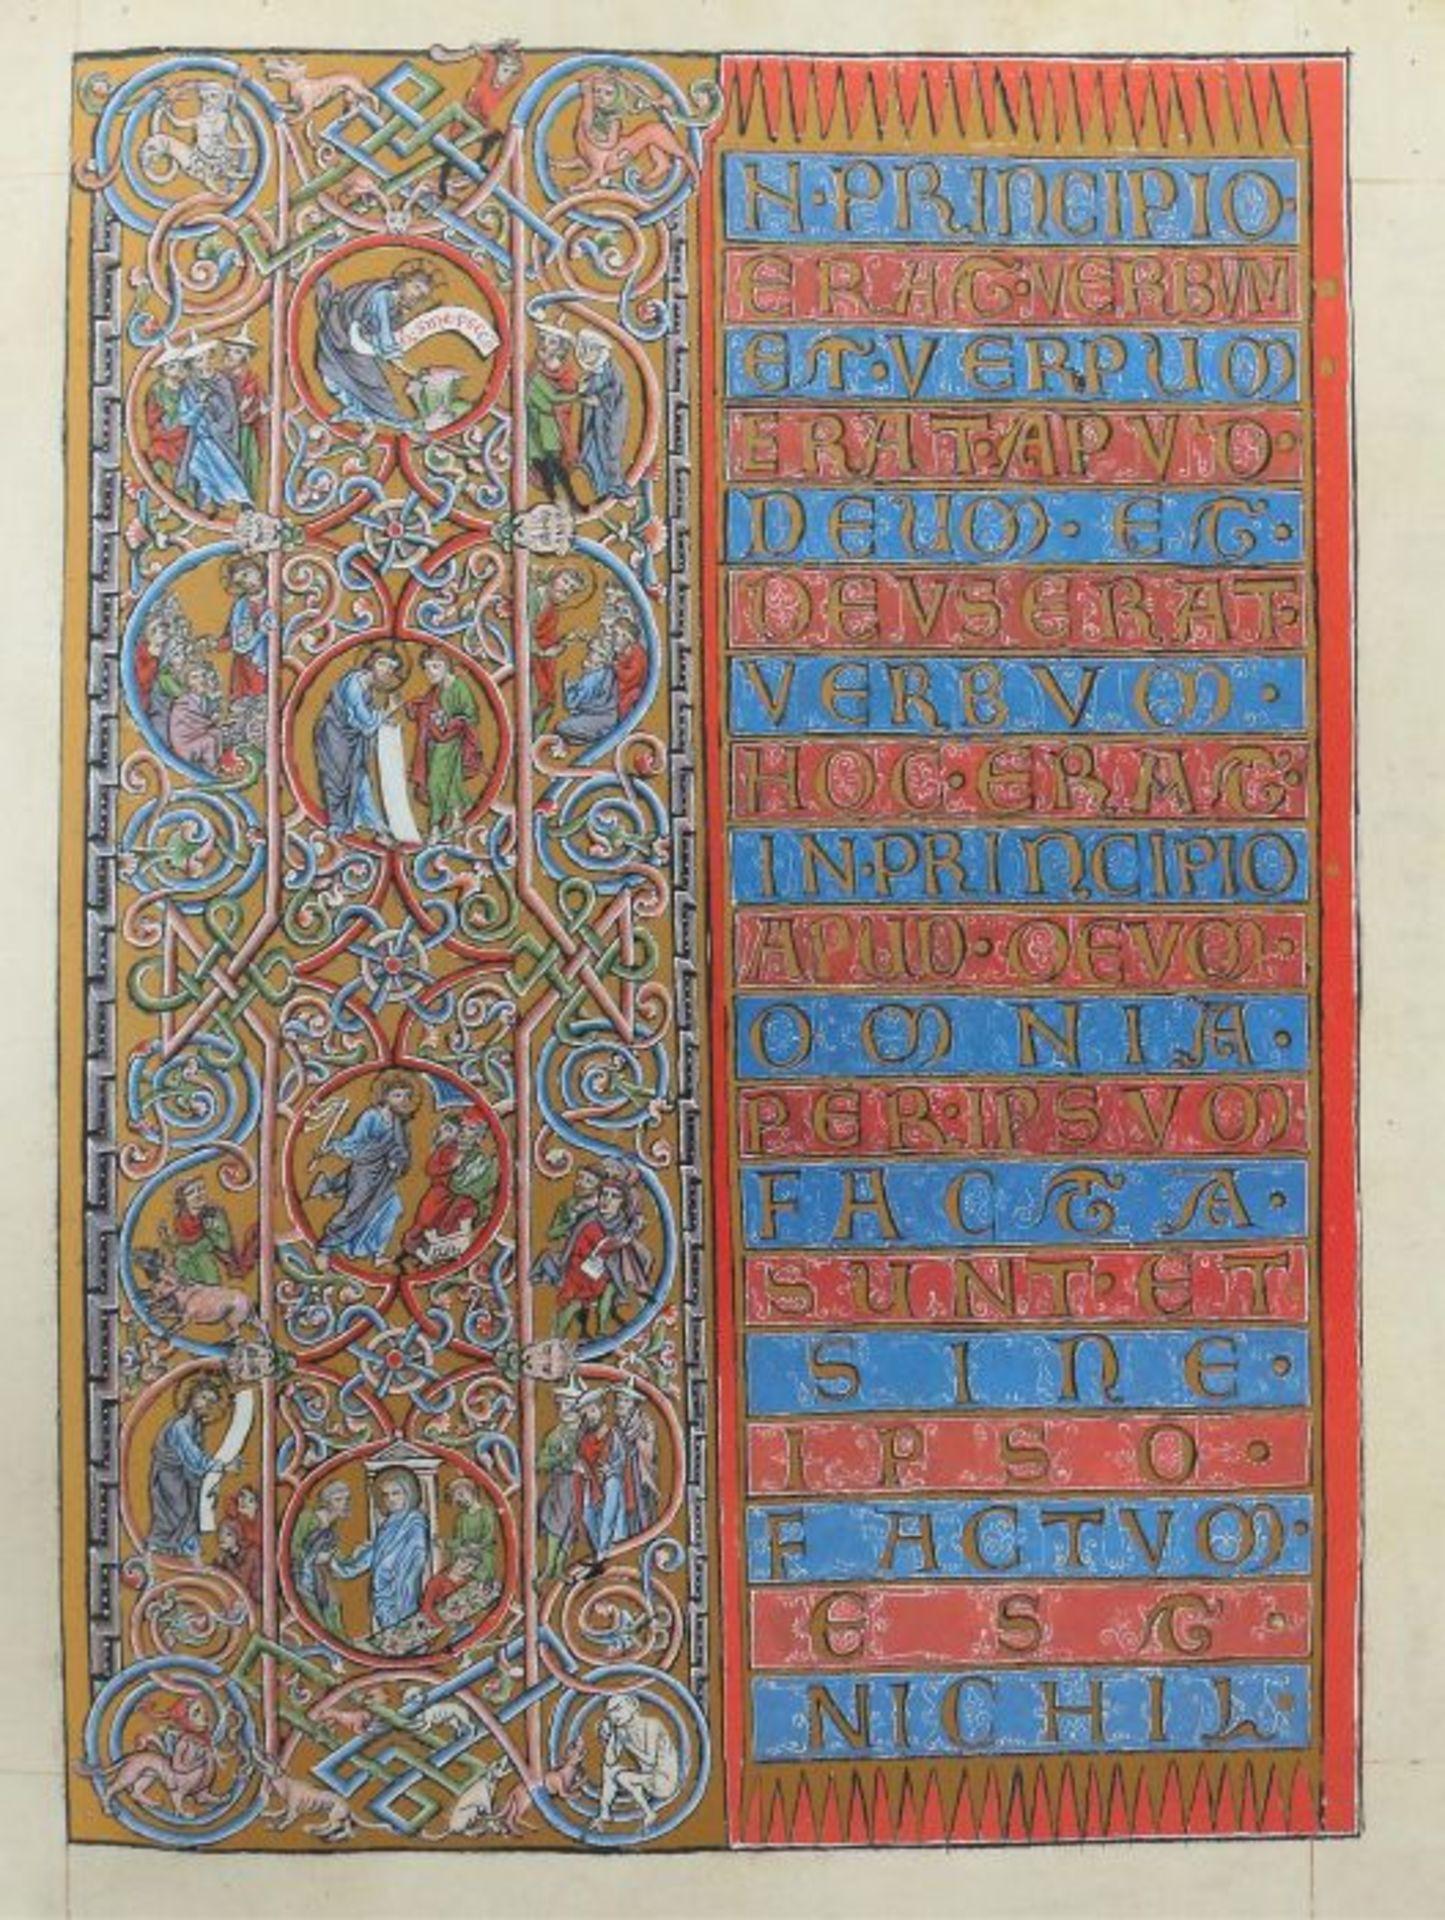 Goslarer Evangeliar Aus dem Stadtarchiv Goslar, Volumen XCII der Reihe Codices Selecti, Goslar/ - Bild 2 aus 6